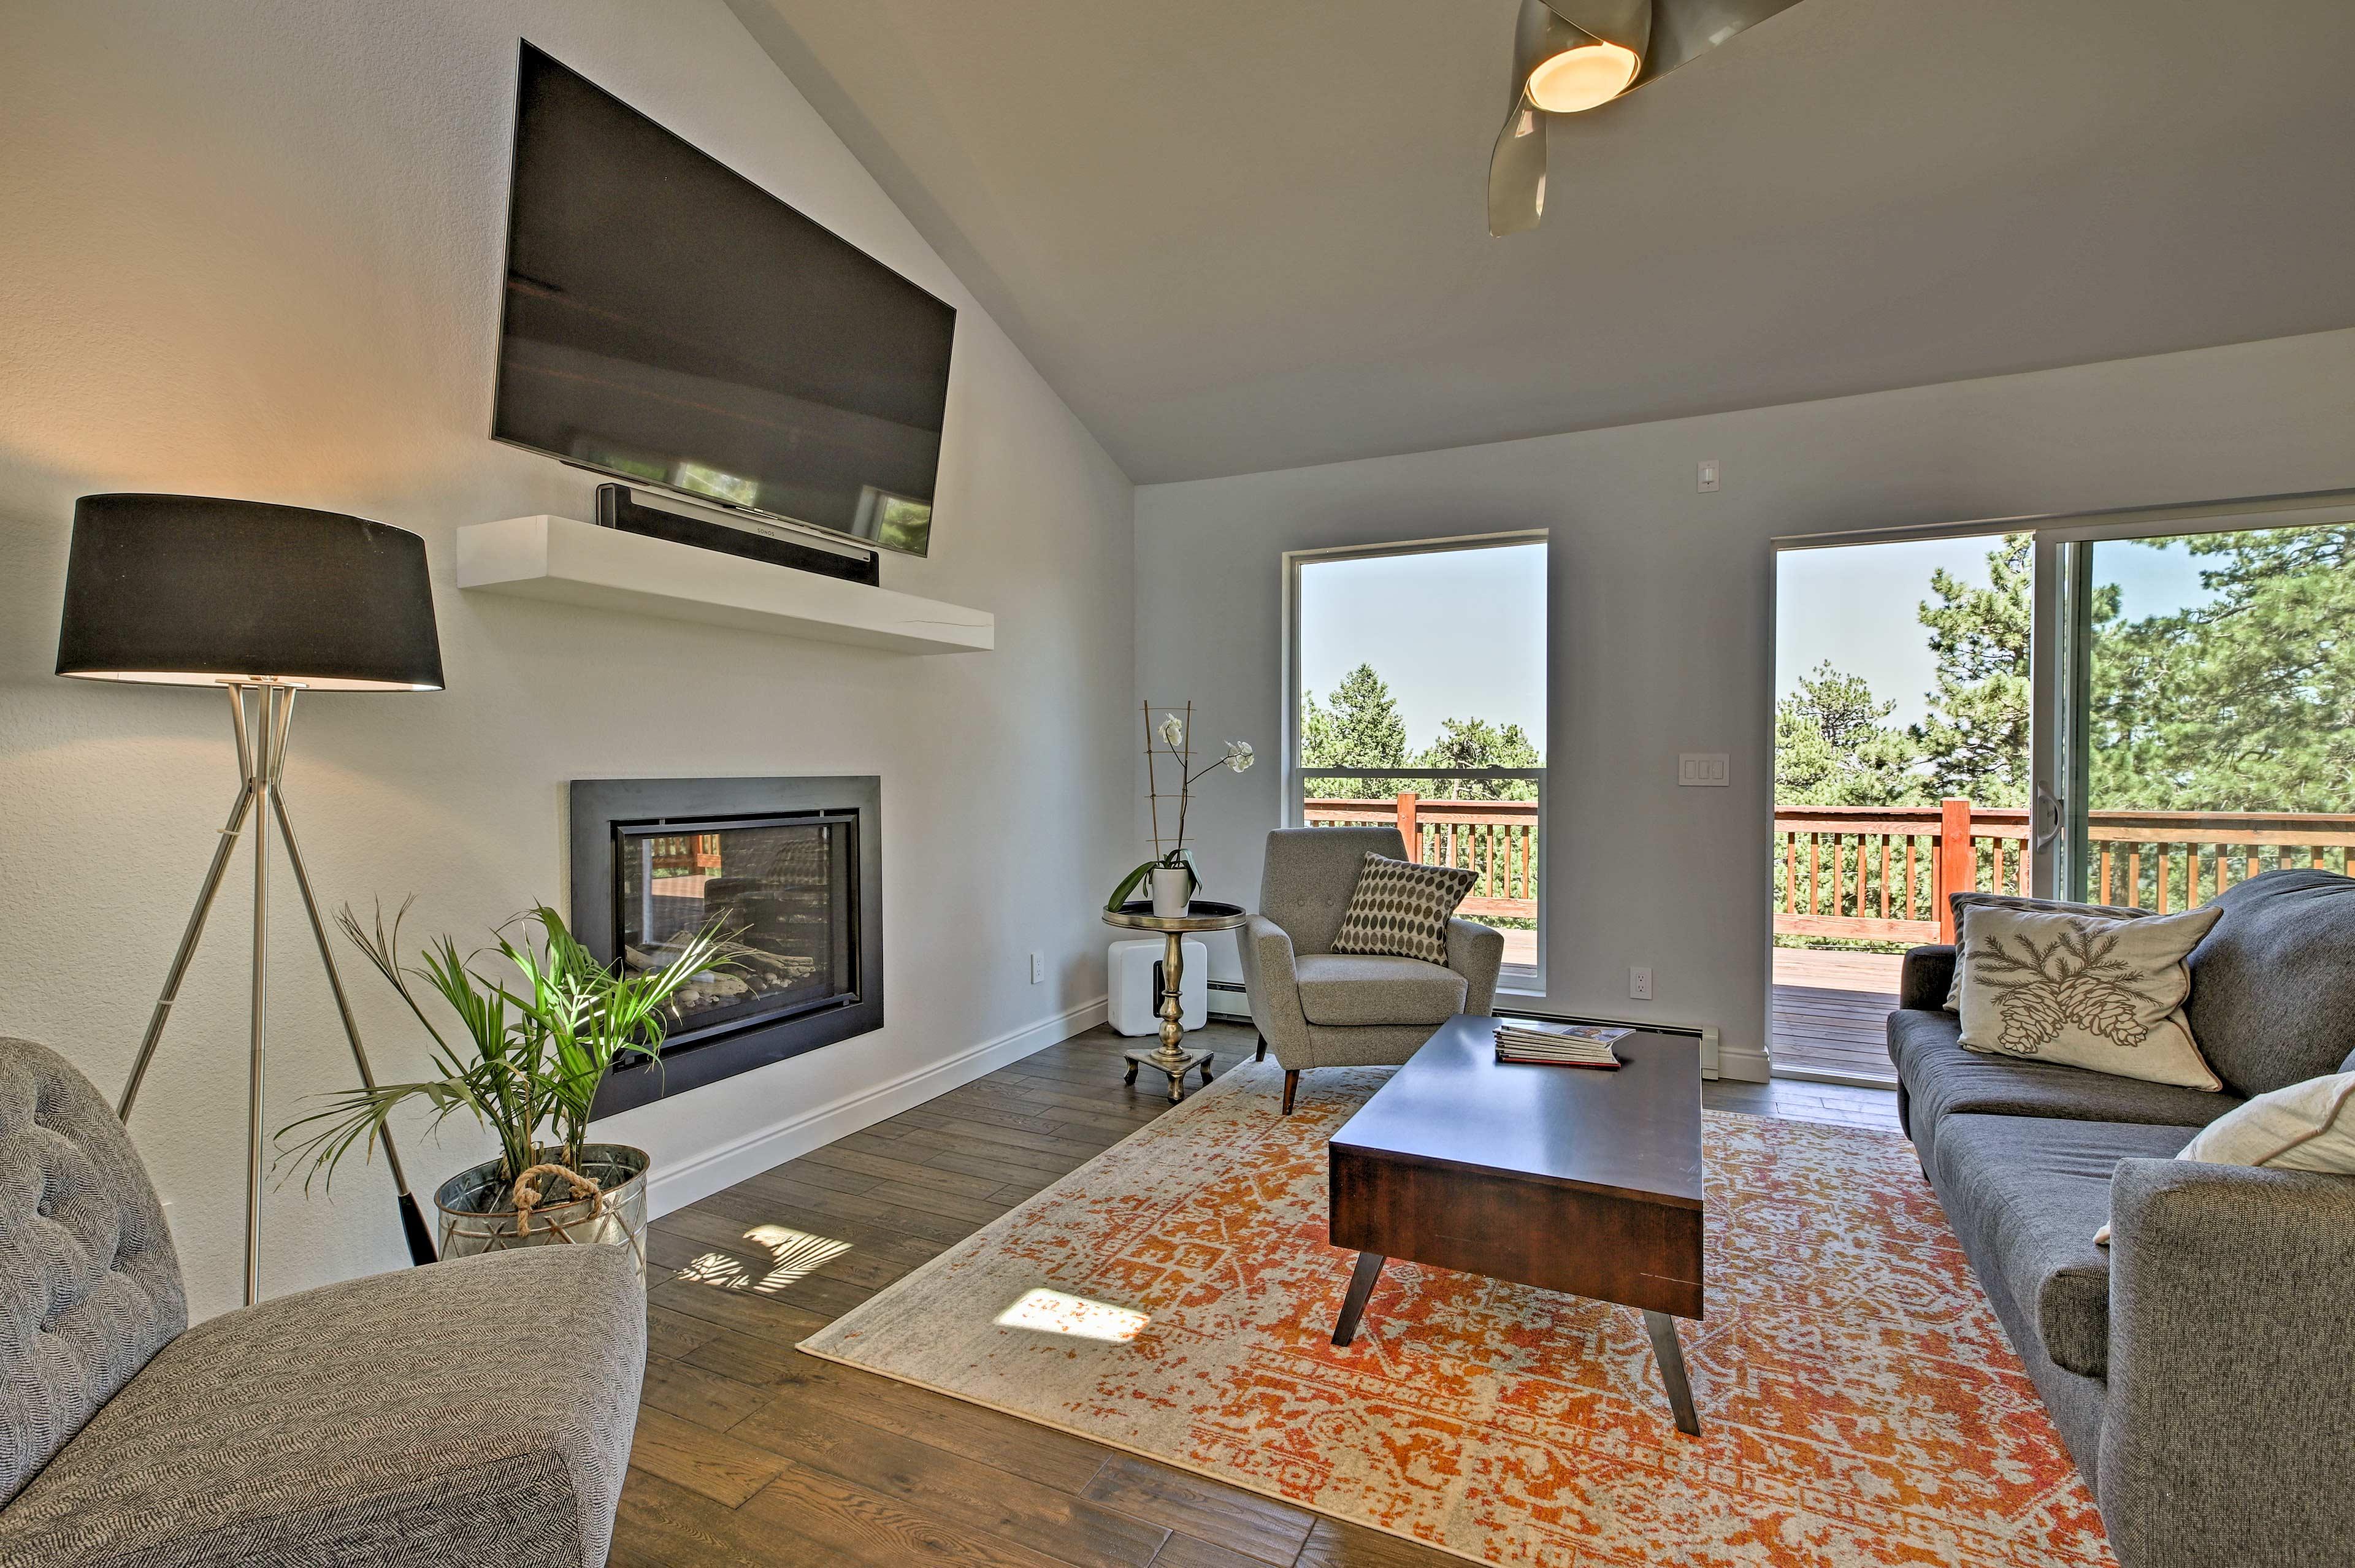 Book your Colorado mountain escape to this 3-bed, 2.5-bath vacation rental!